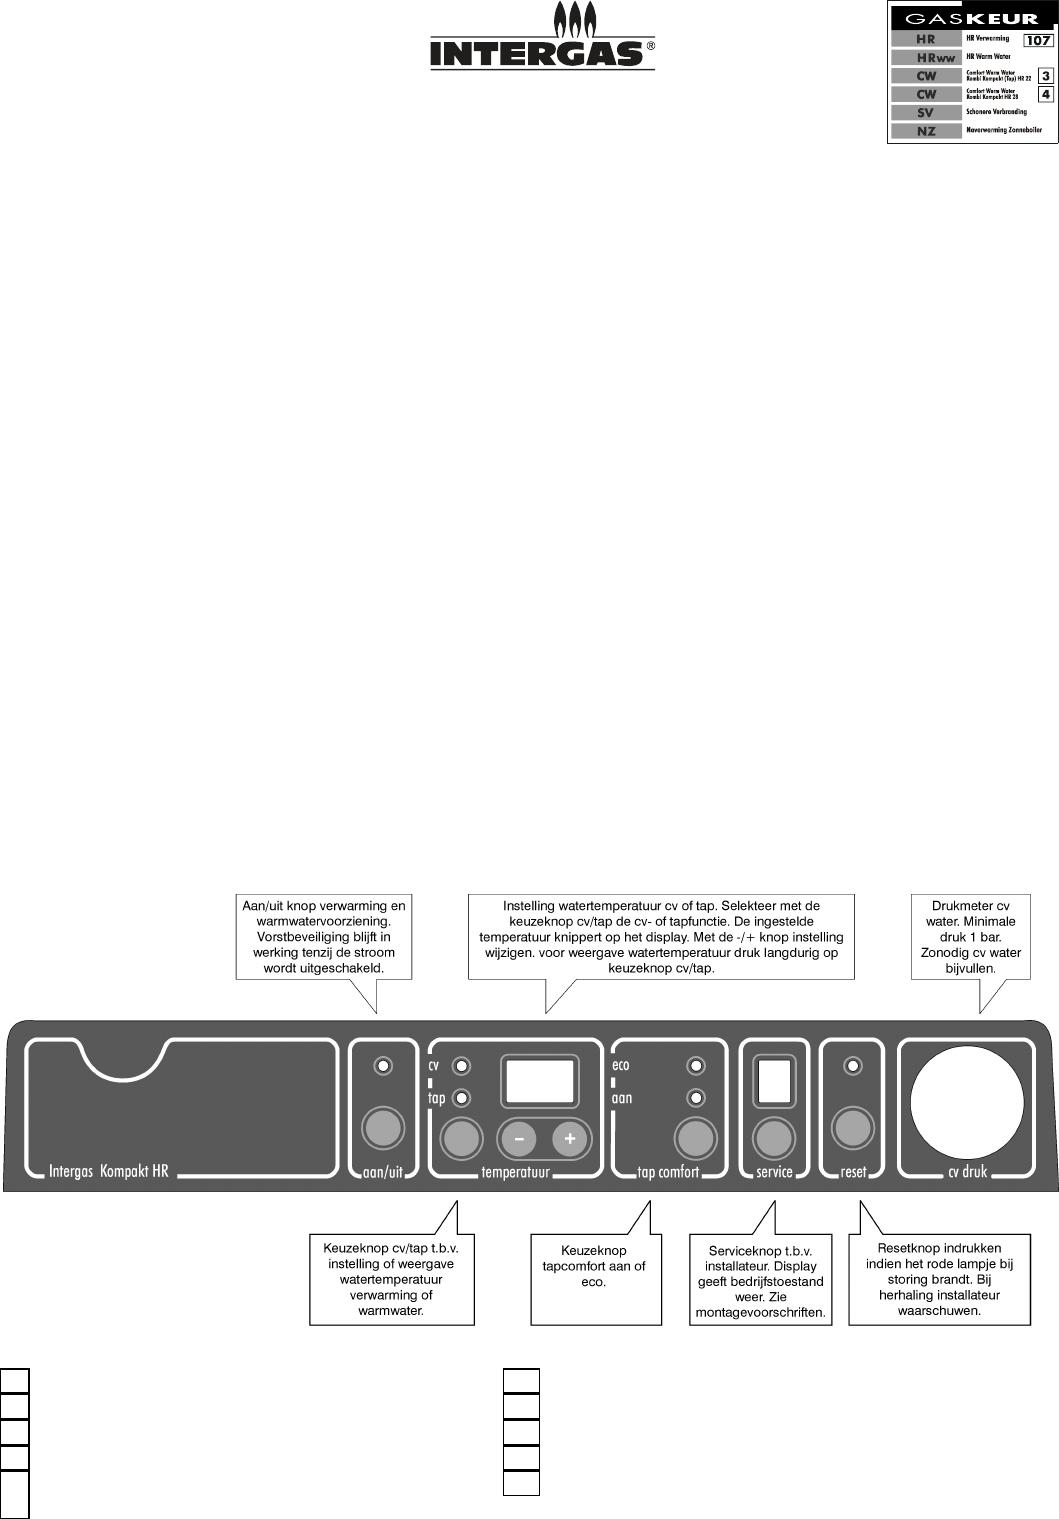 handleiding intergas hr 22 kombi kompakt  pagina 1 van 2